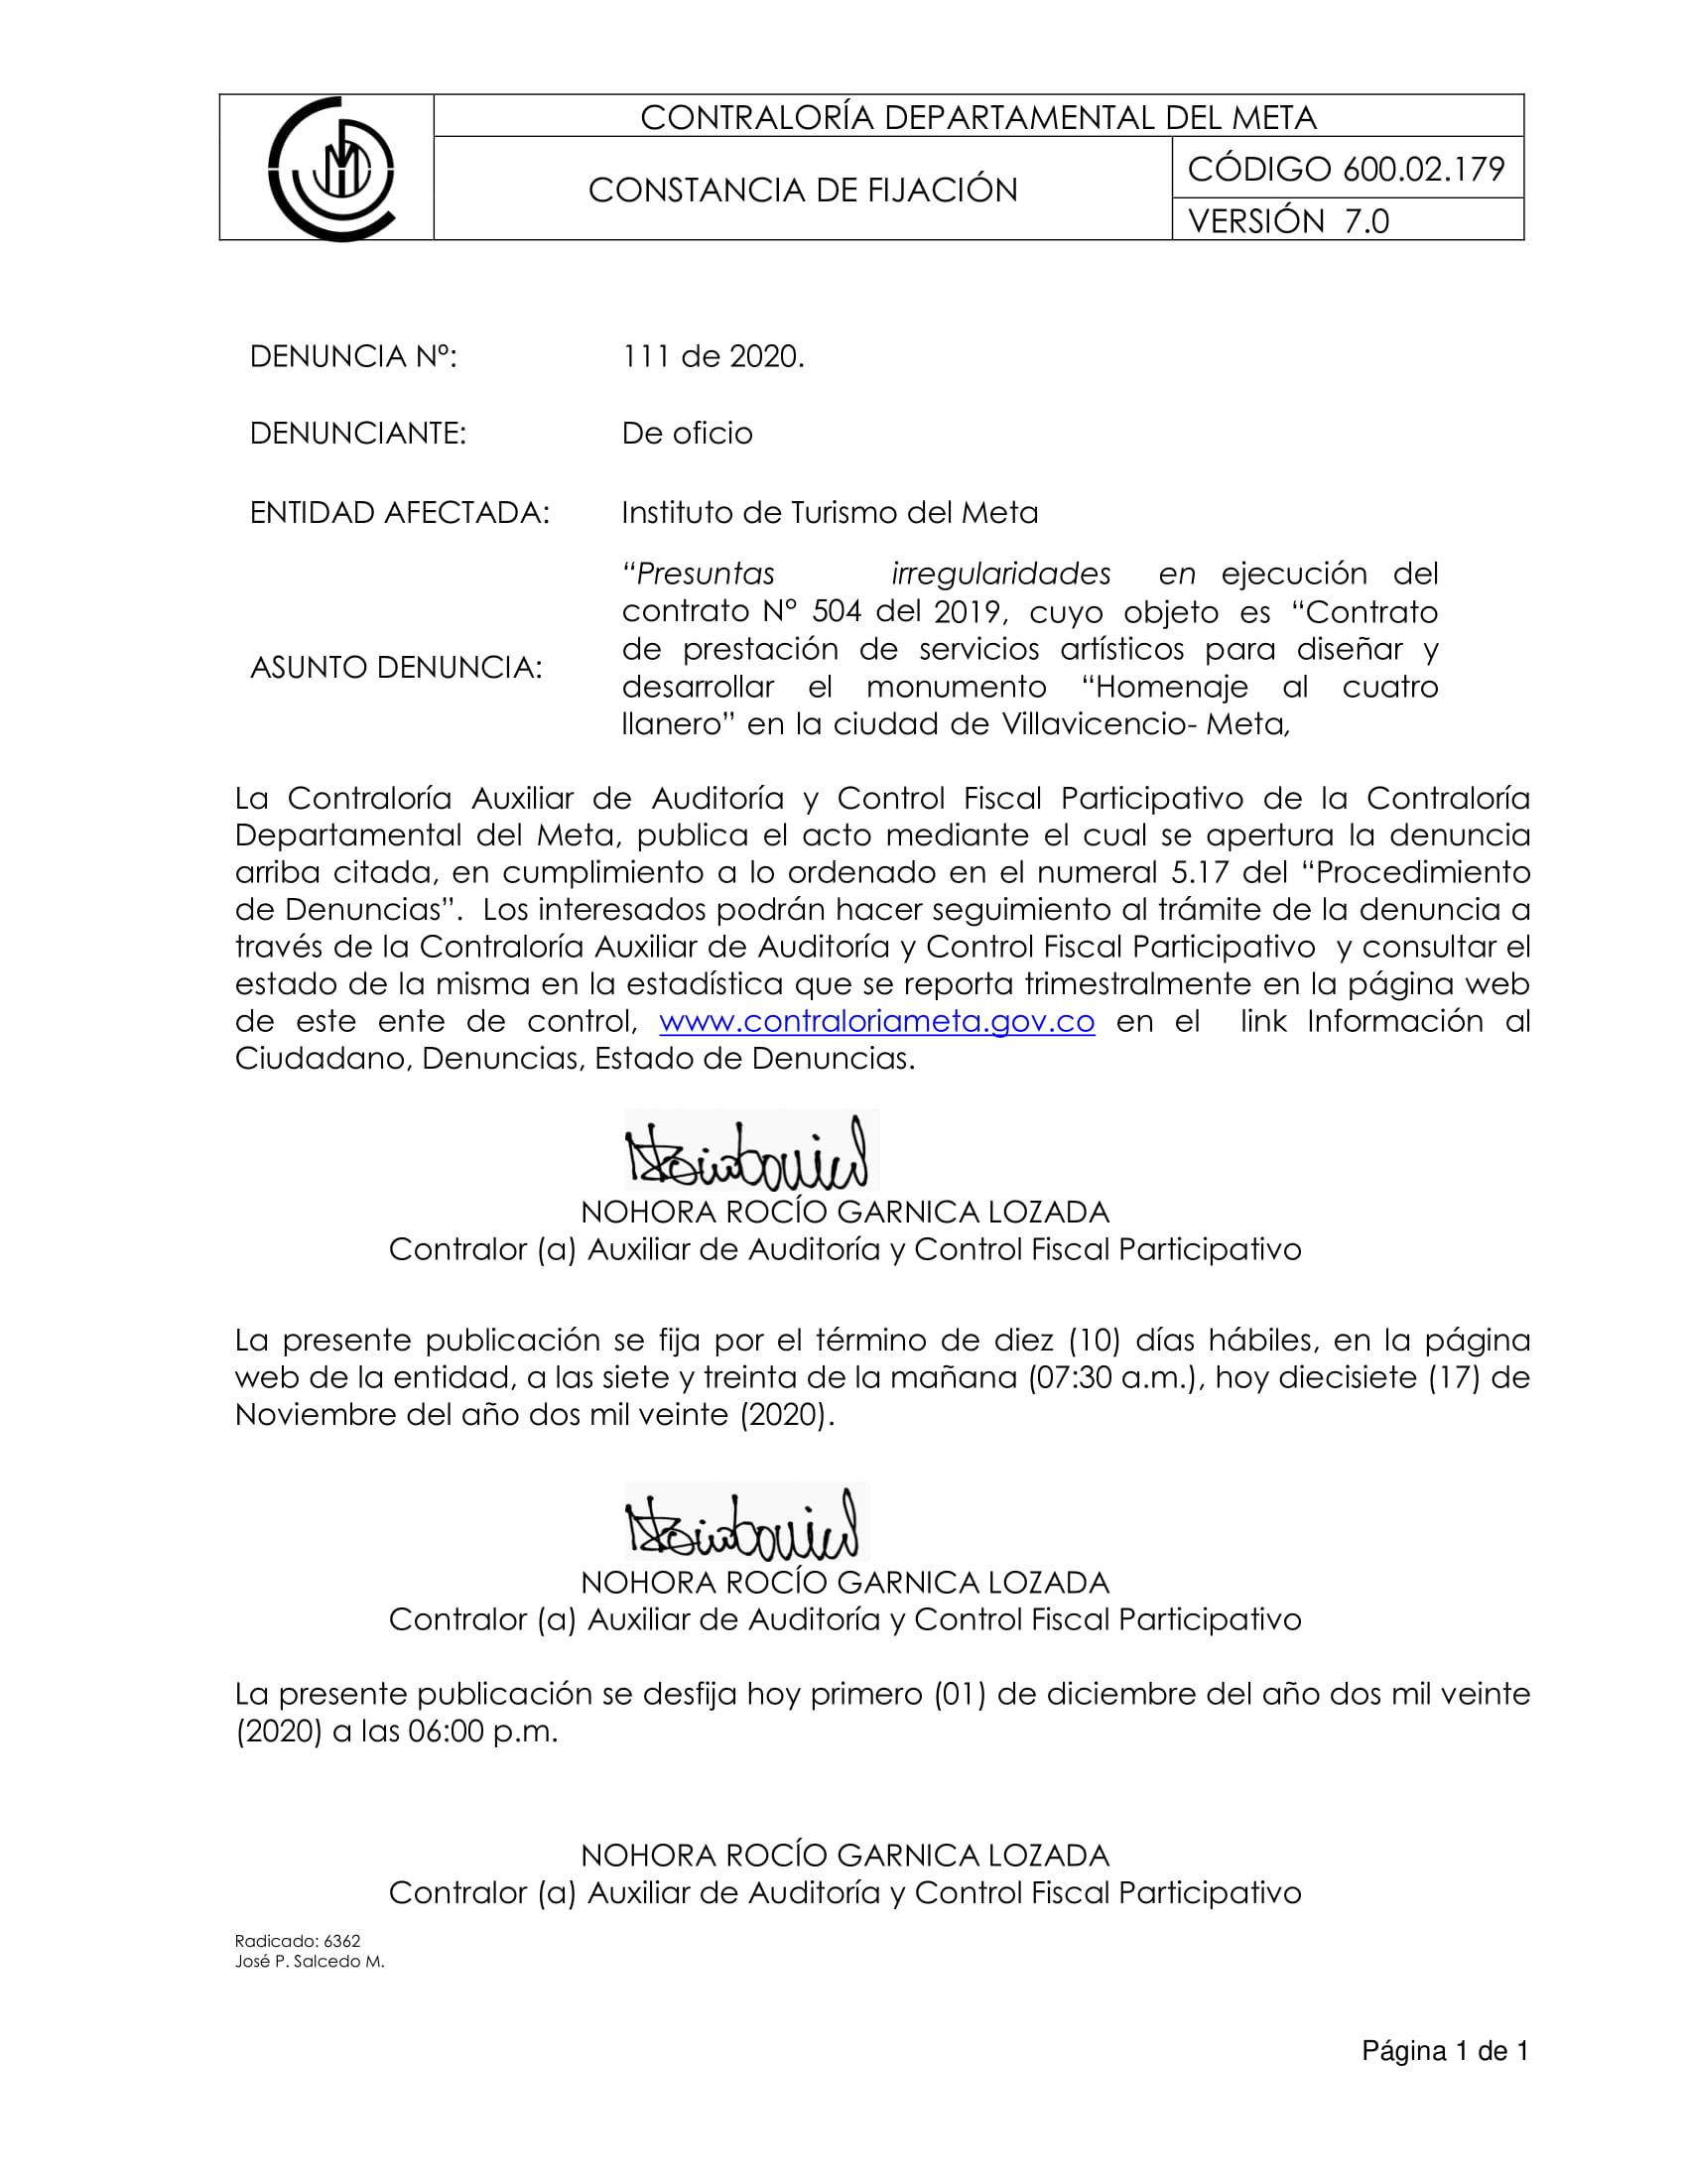 600-02-179_constancia_de_fijacion_d-111-de-2020-1